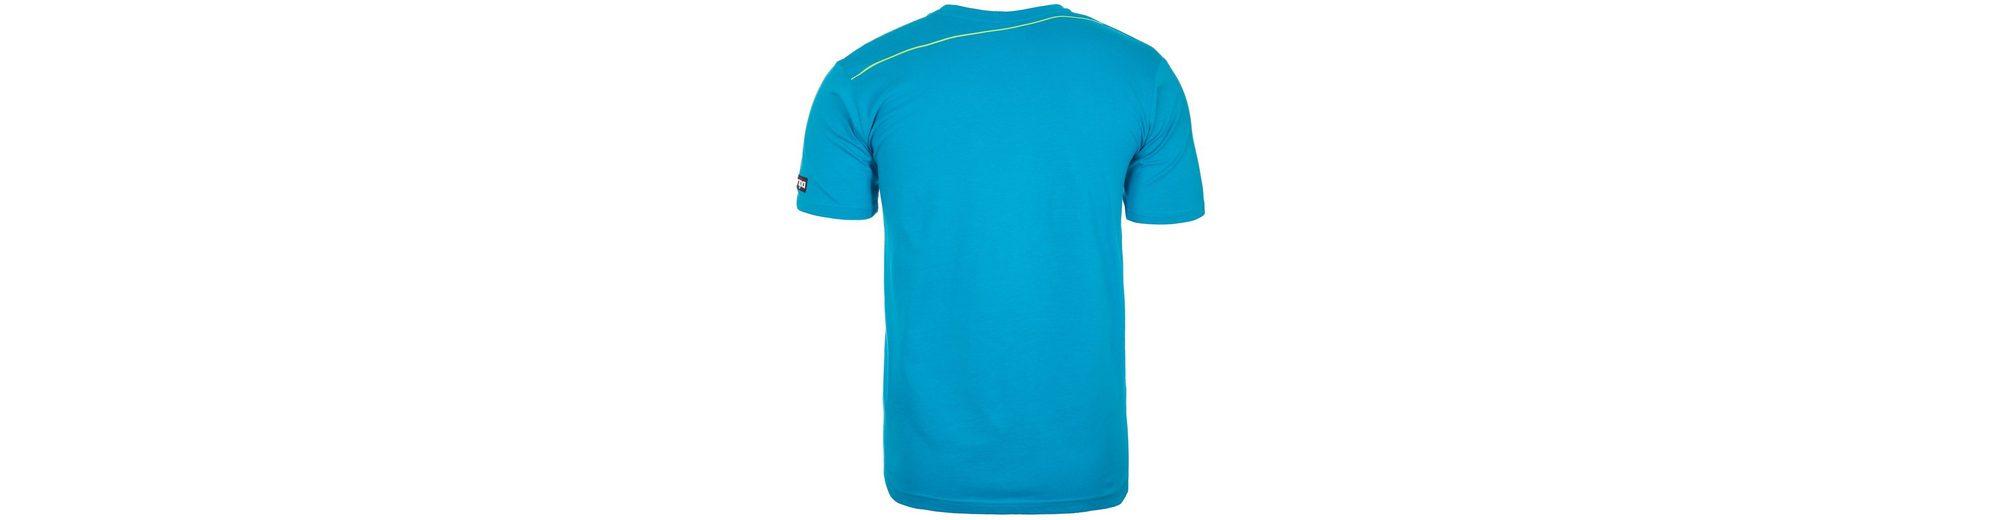 Billig 2018 Neueste KEMPA Core Baumwoll V-Kragen T-Shirt Herren Komfortabel Zu Verkaufen wqtpLPJE